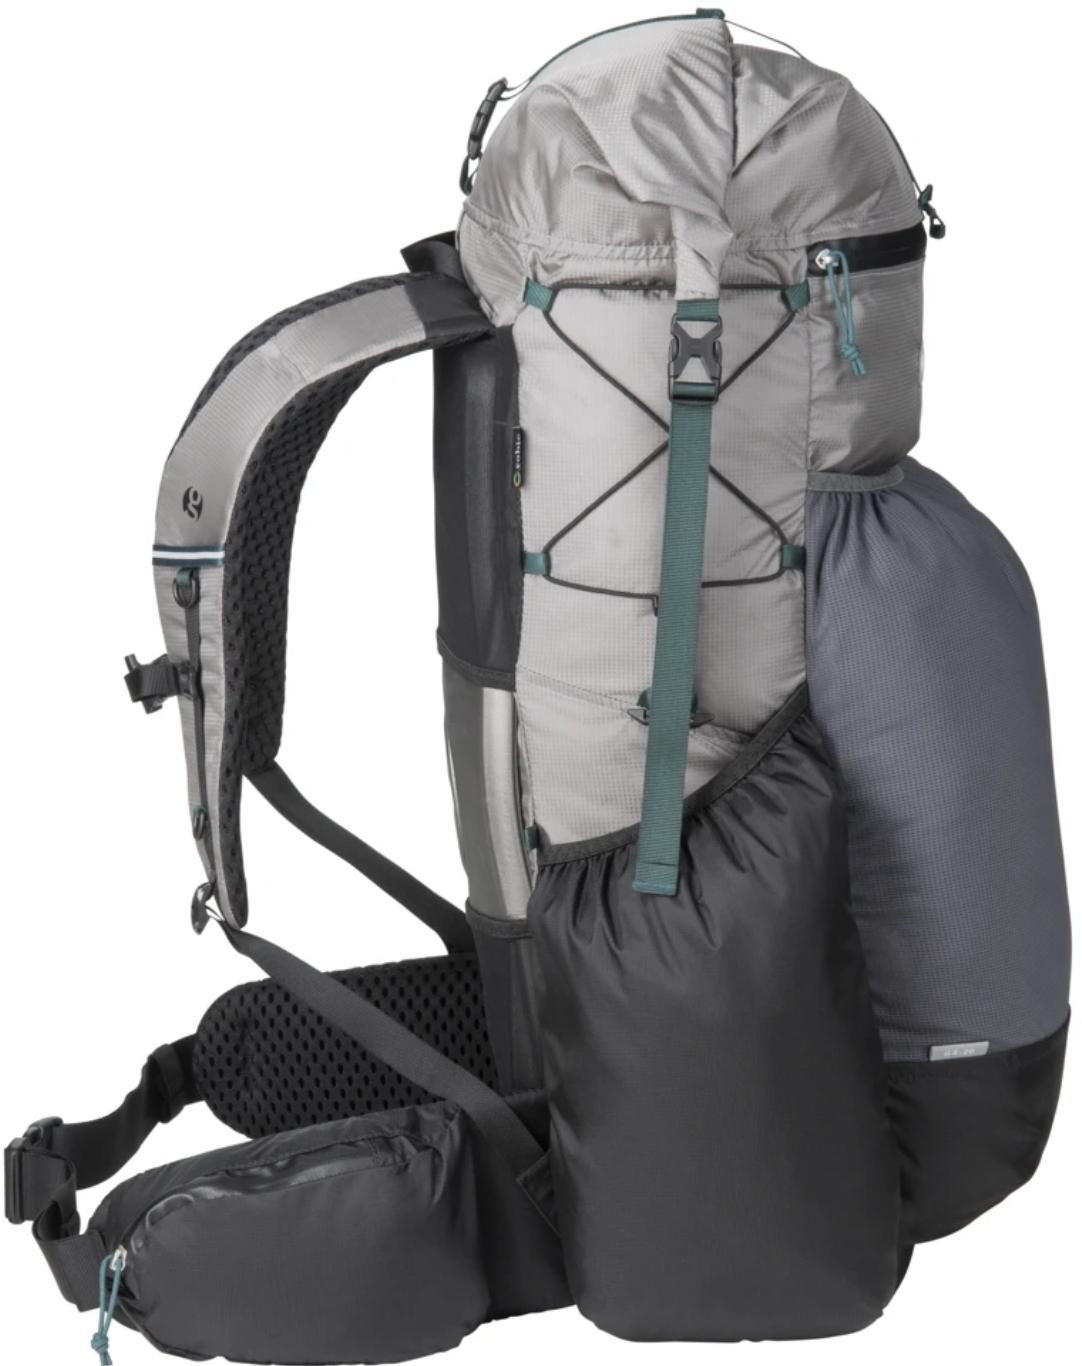 Best backpacking packs